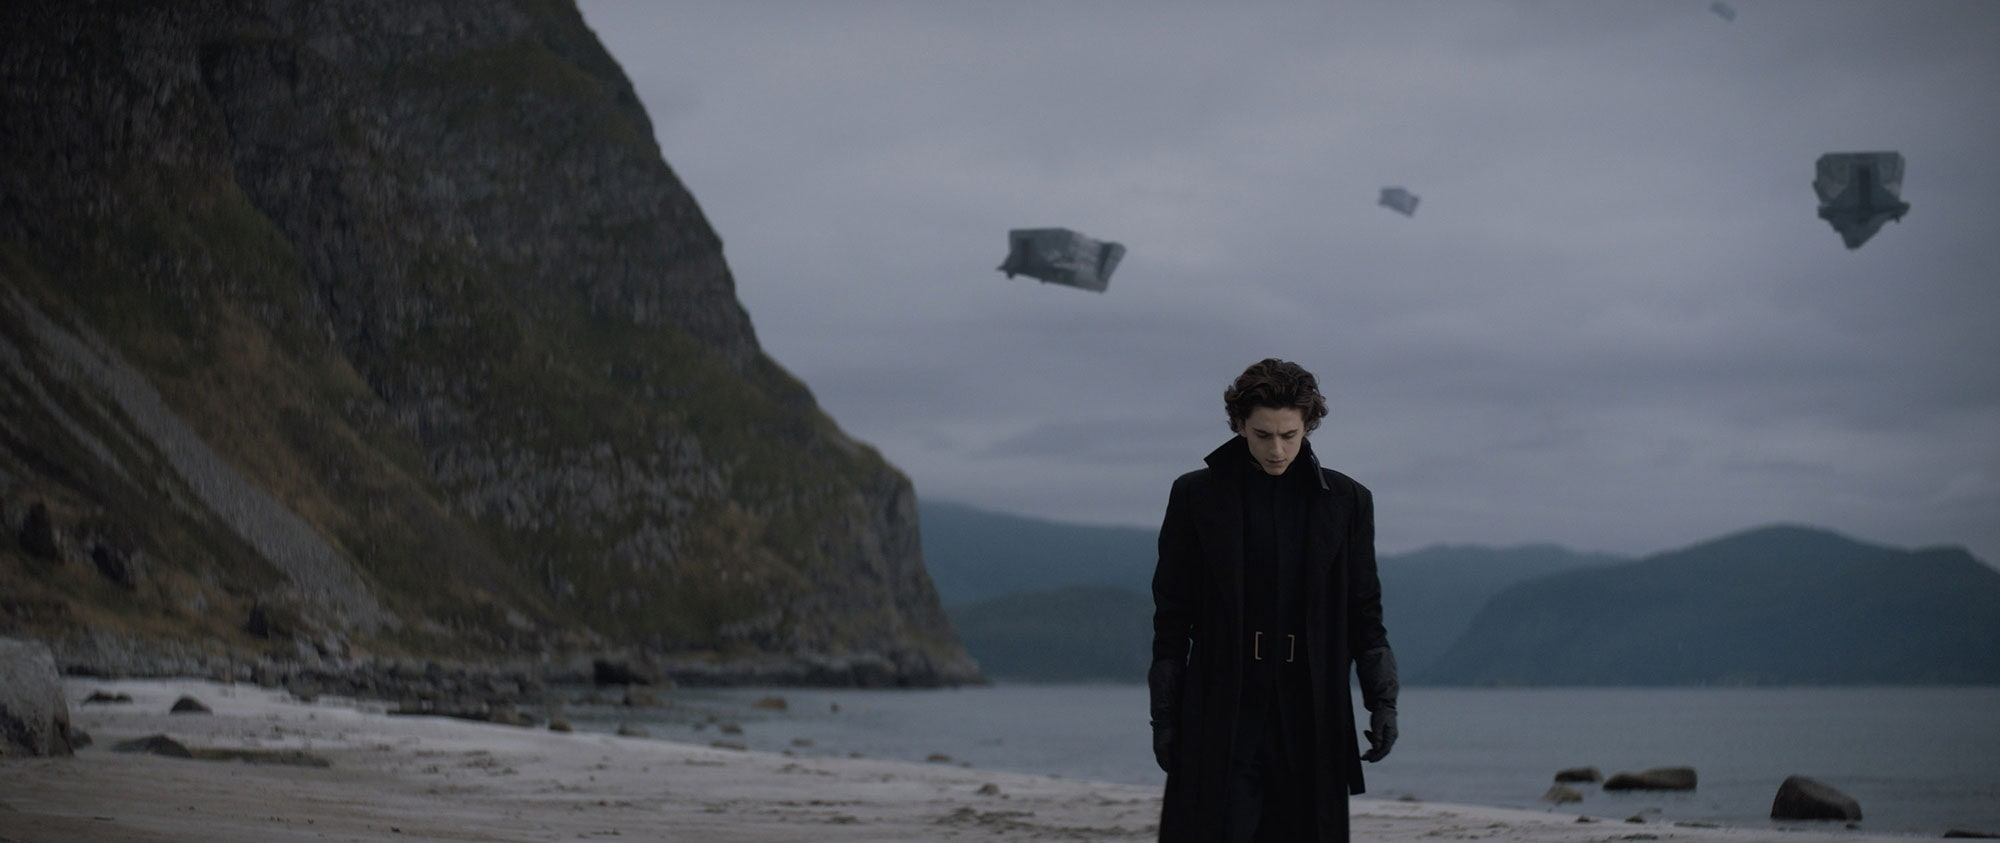 Dune-2020-Timothee-Chalamet-as-Paul-Atreides